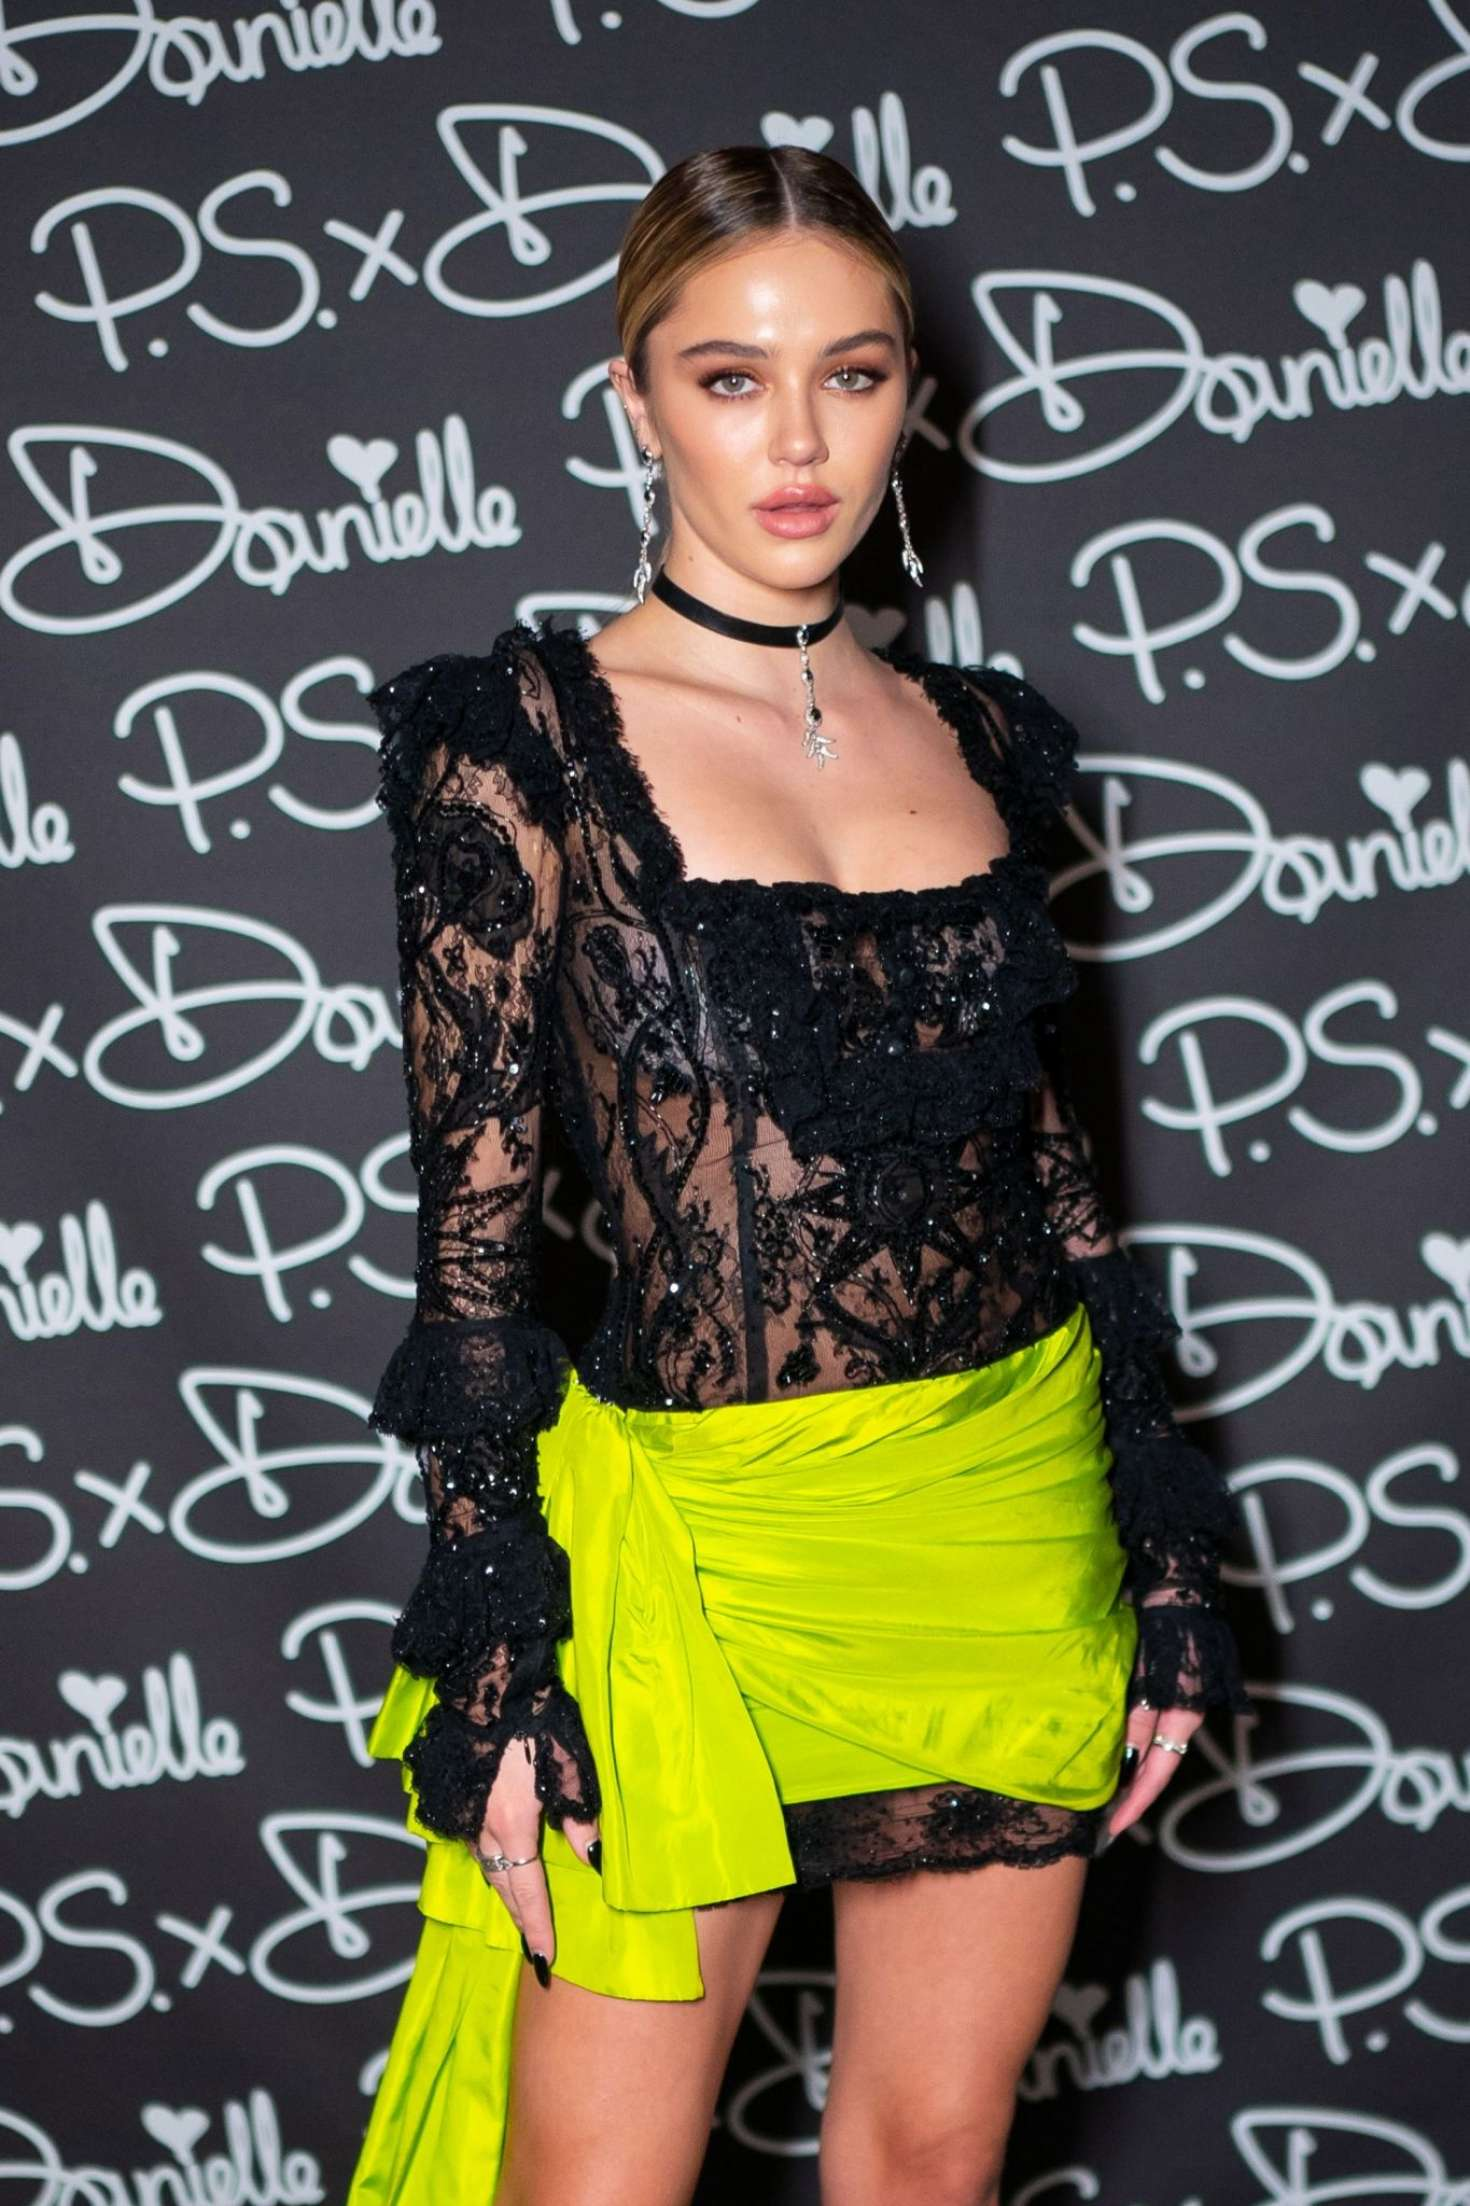 Delilah Hamlin - P.S. x Danielle Launch by Danielle Priano in NYC